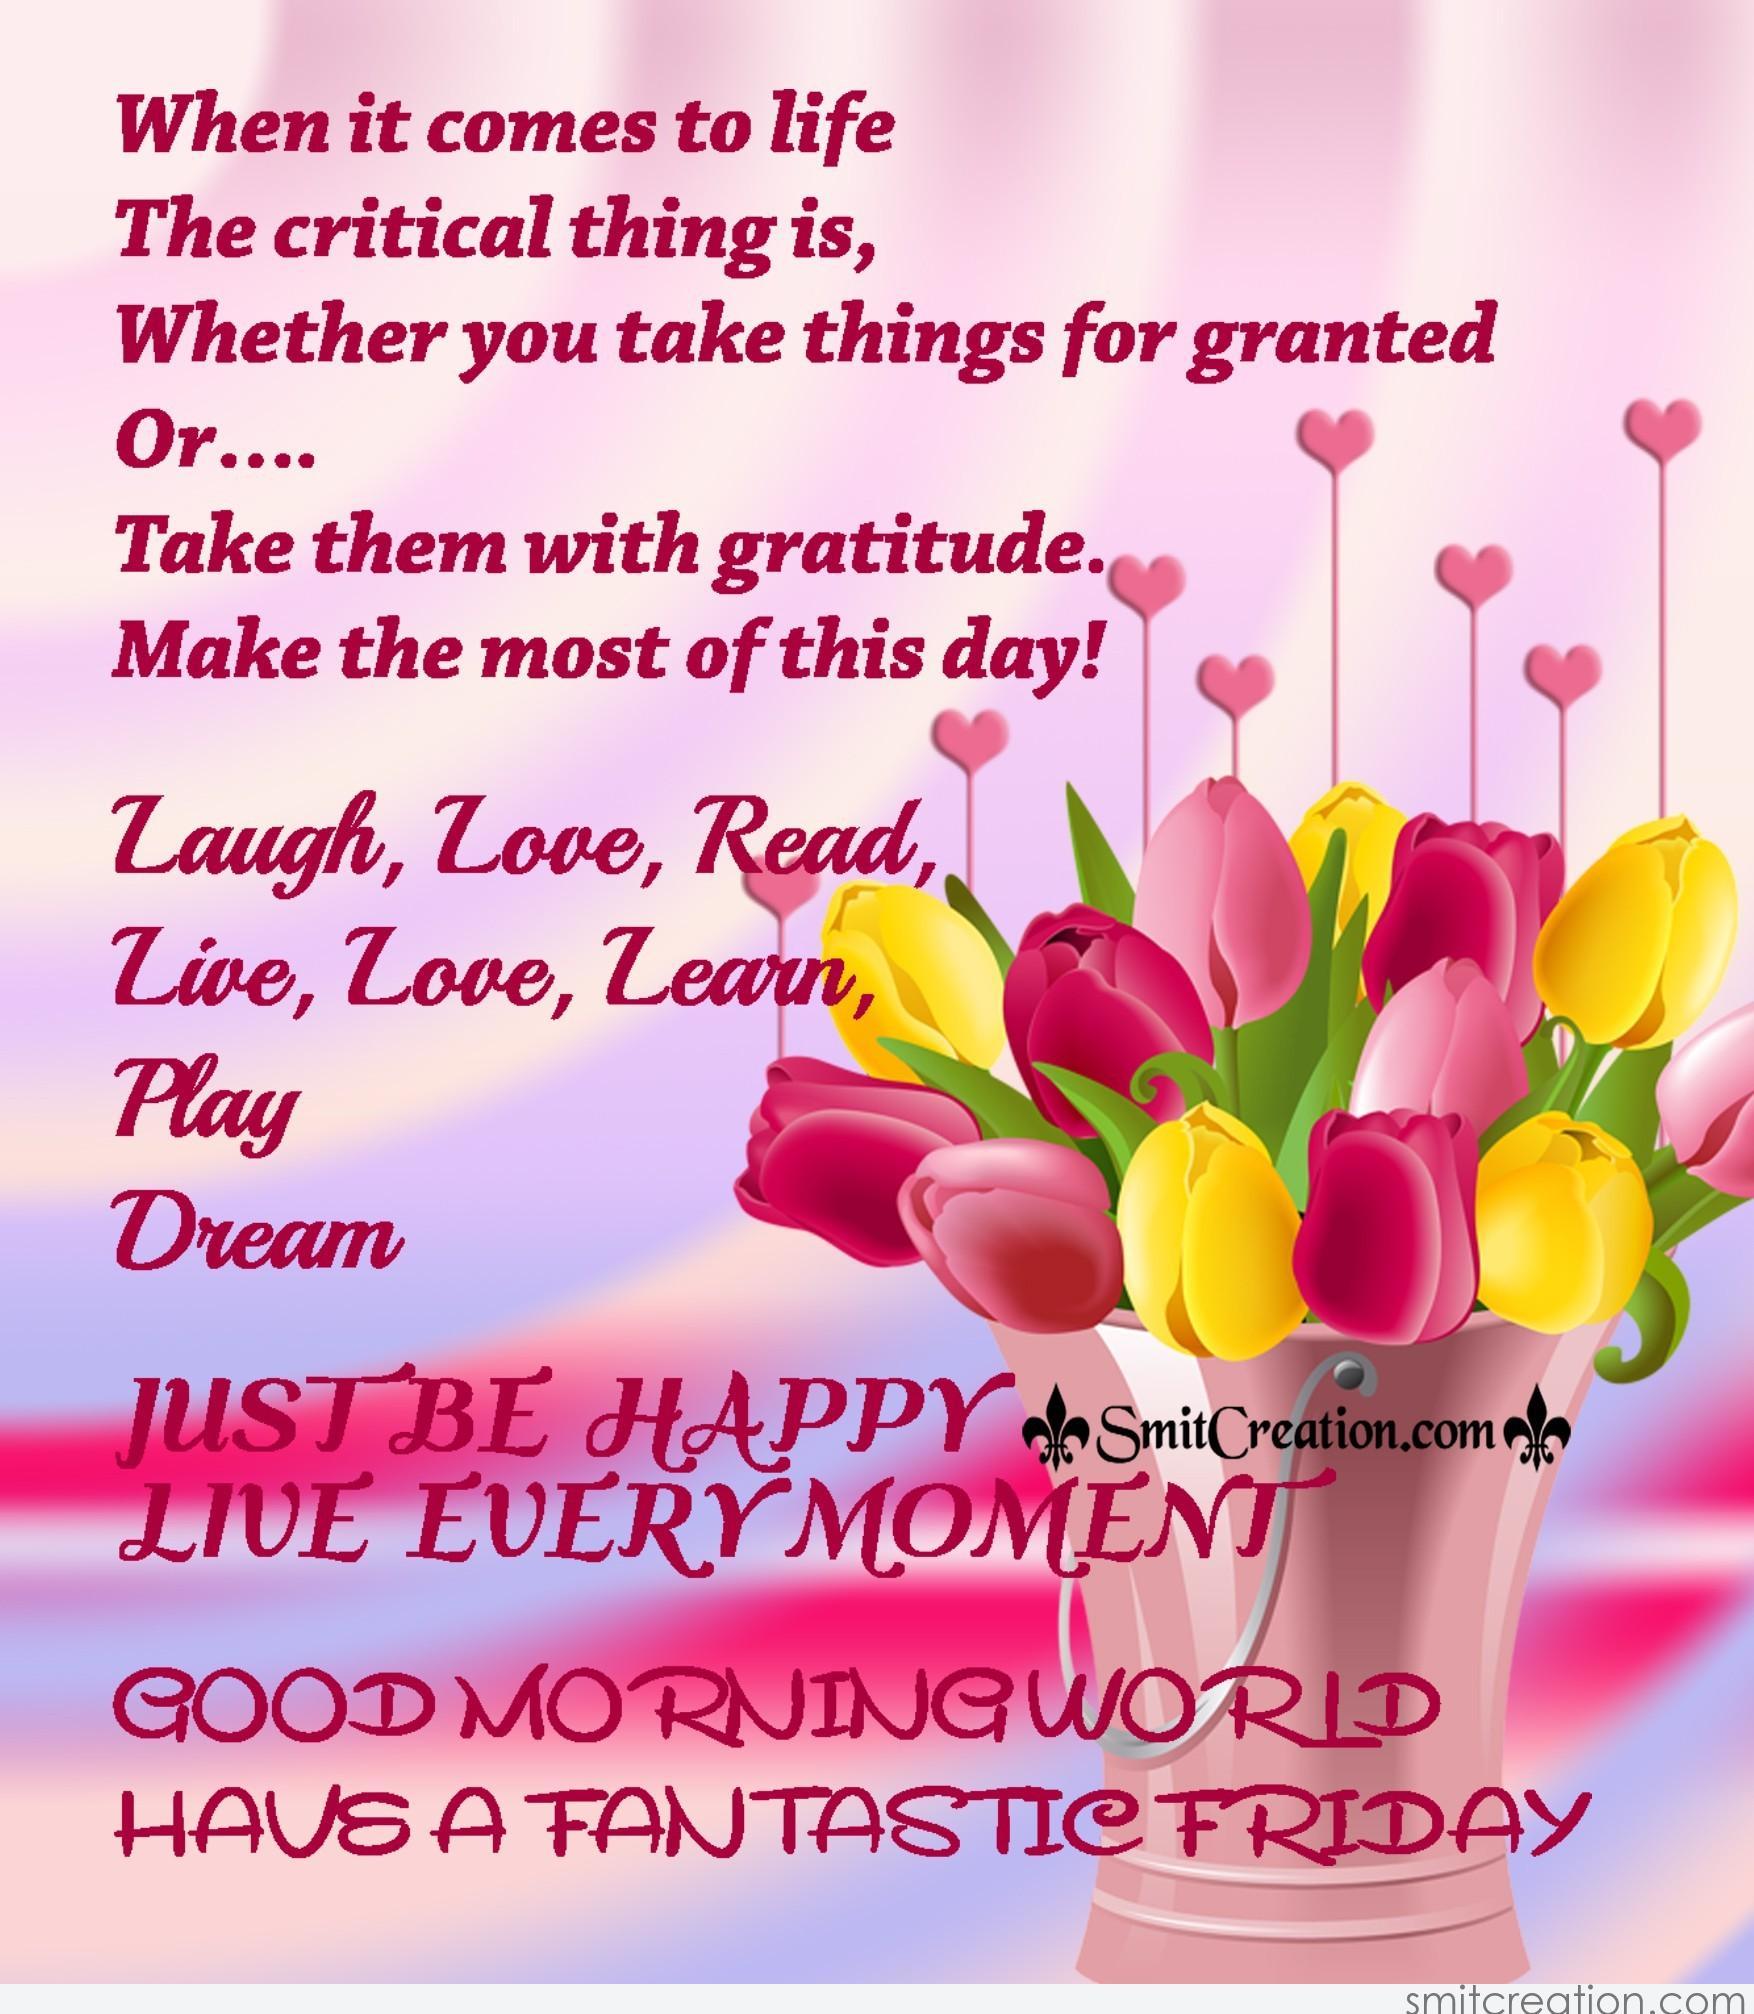 Good Morning World Have A Fantastic Friday Smitcreationcom